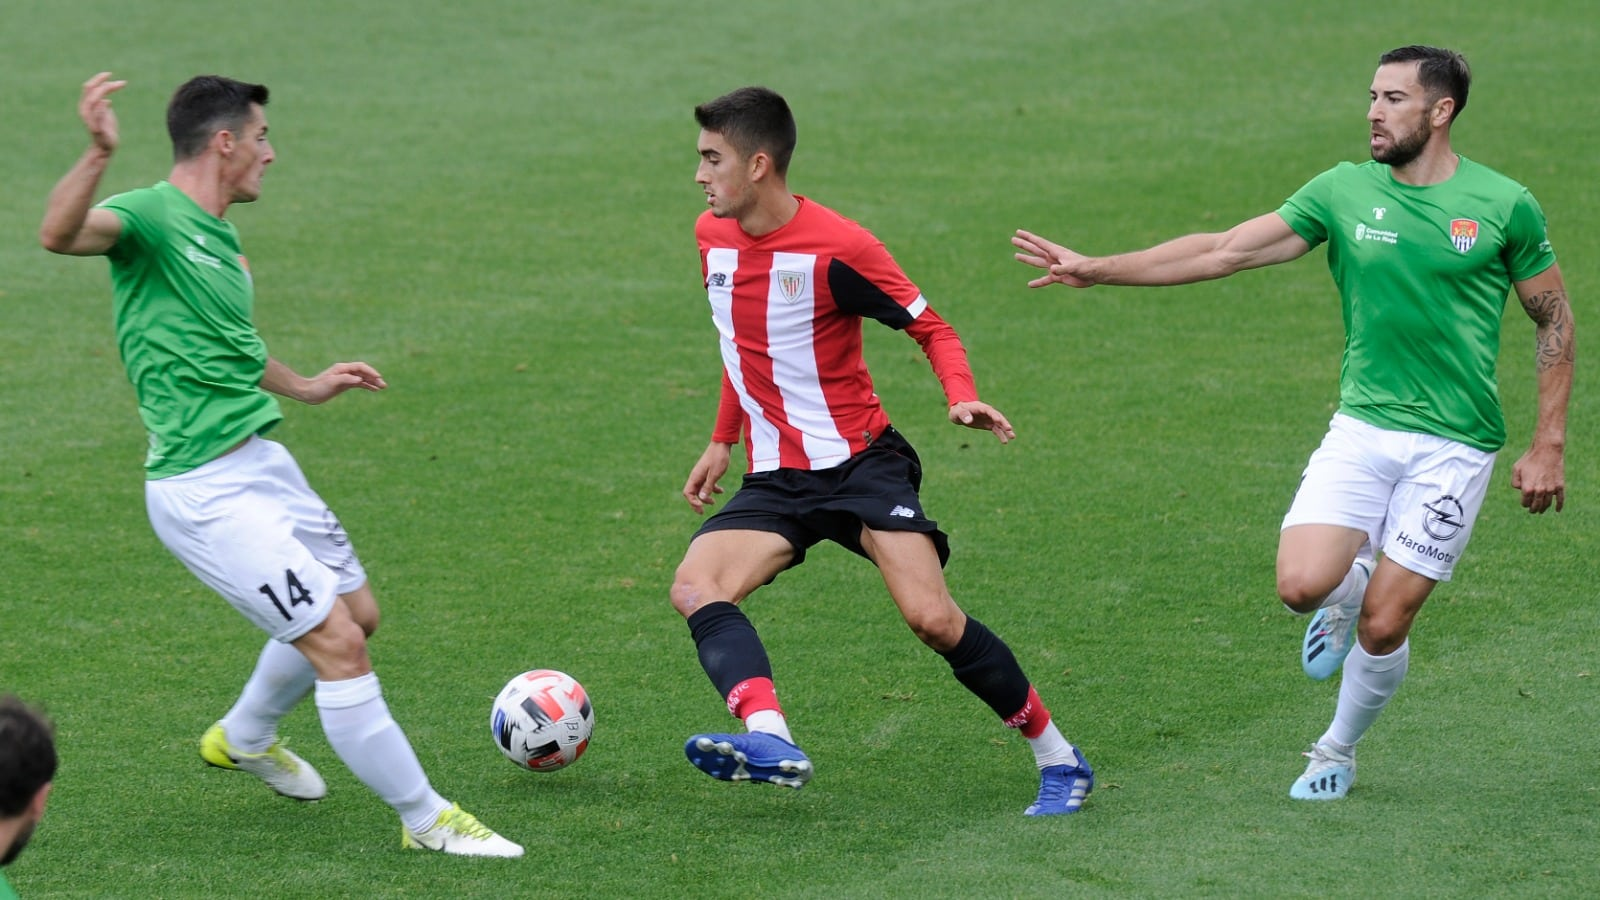 Bilbao Athletic Haro